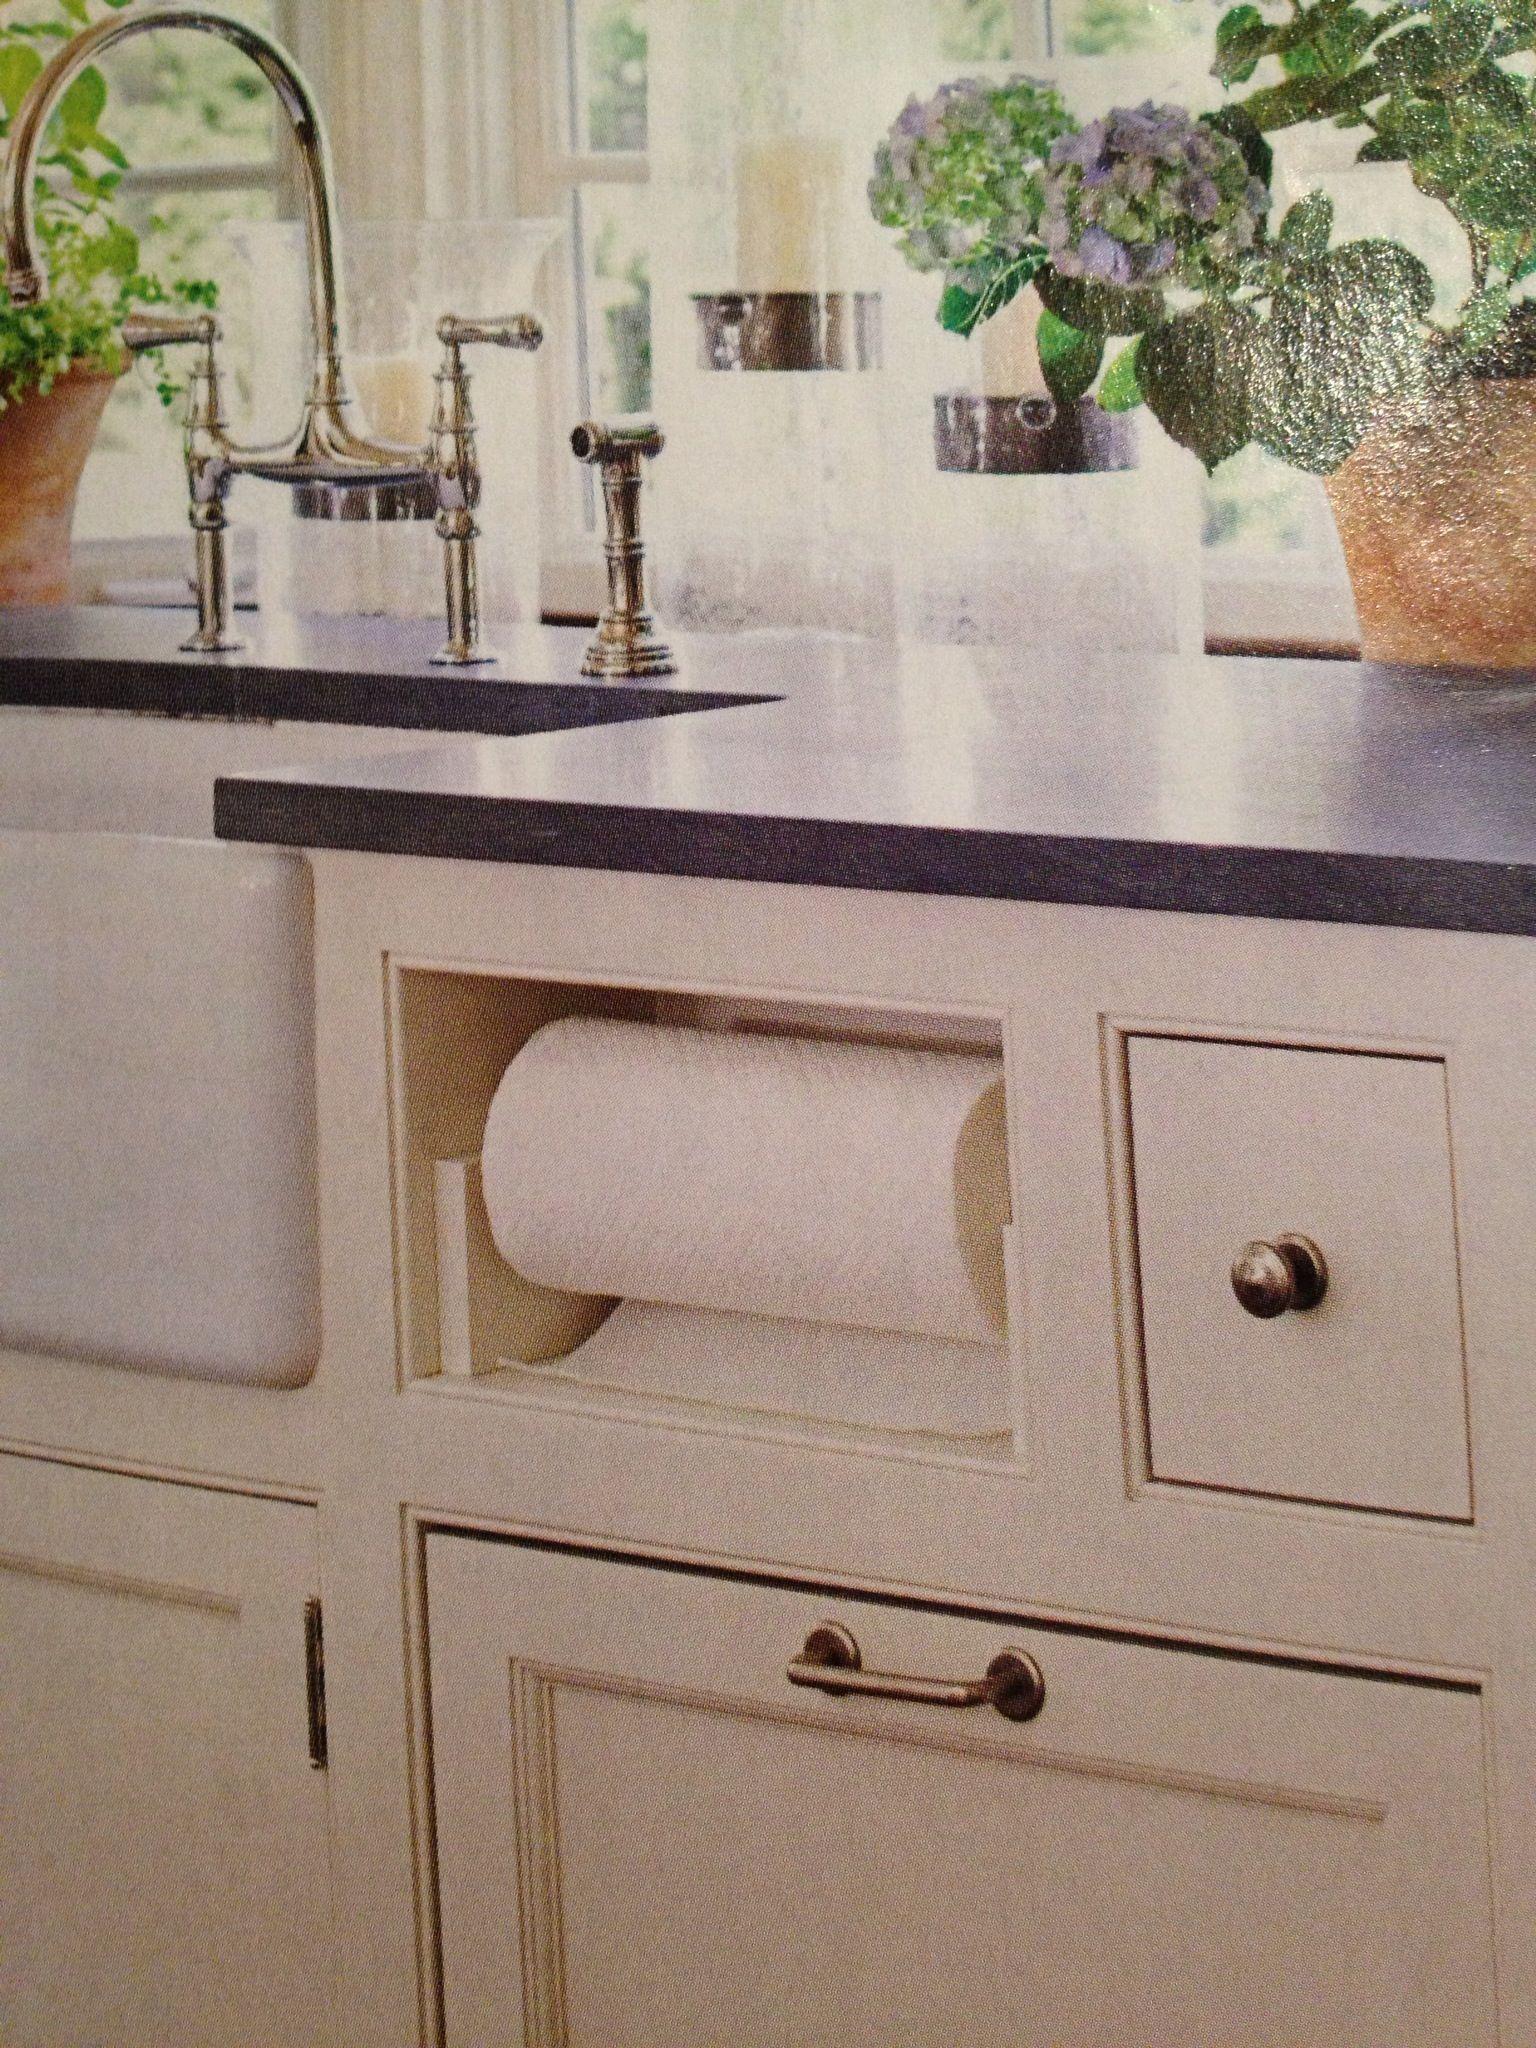 paper towel holder in cabinet | Kitchen remodel, Kitchen, Home